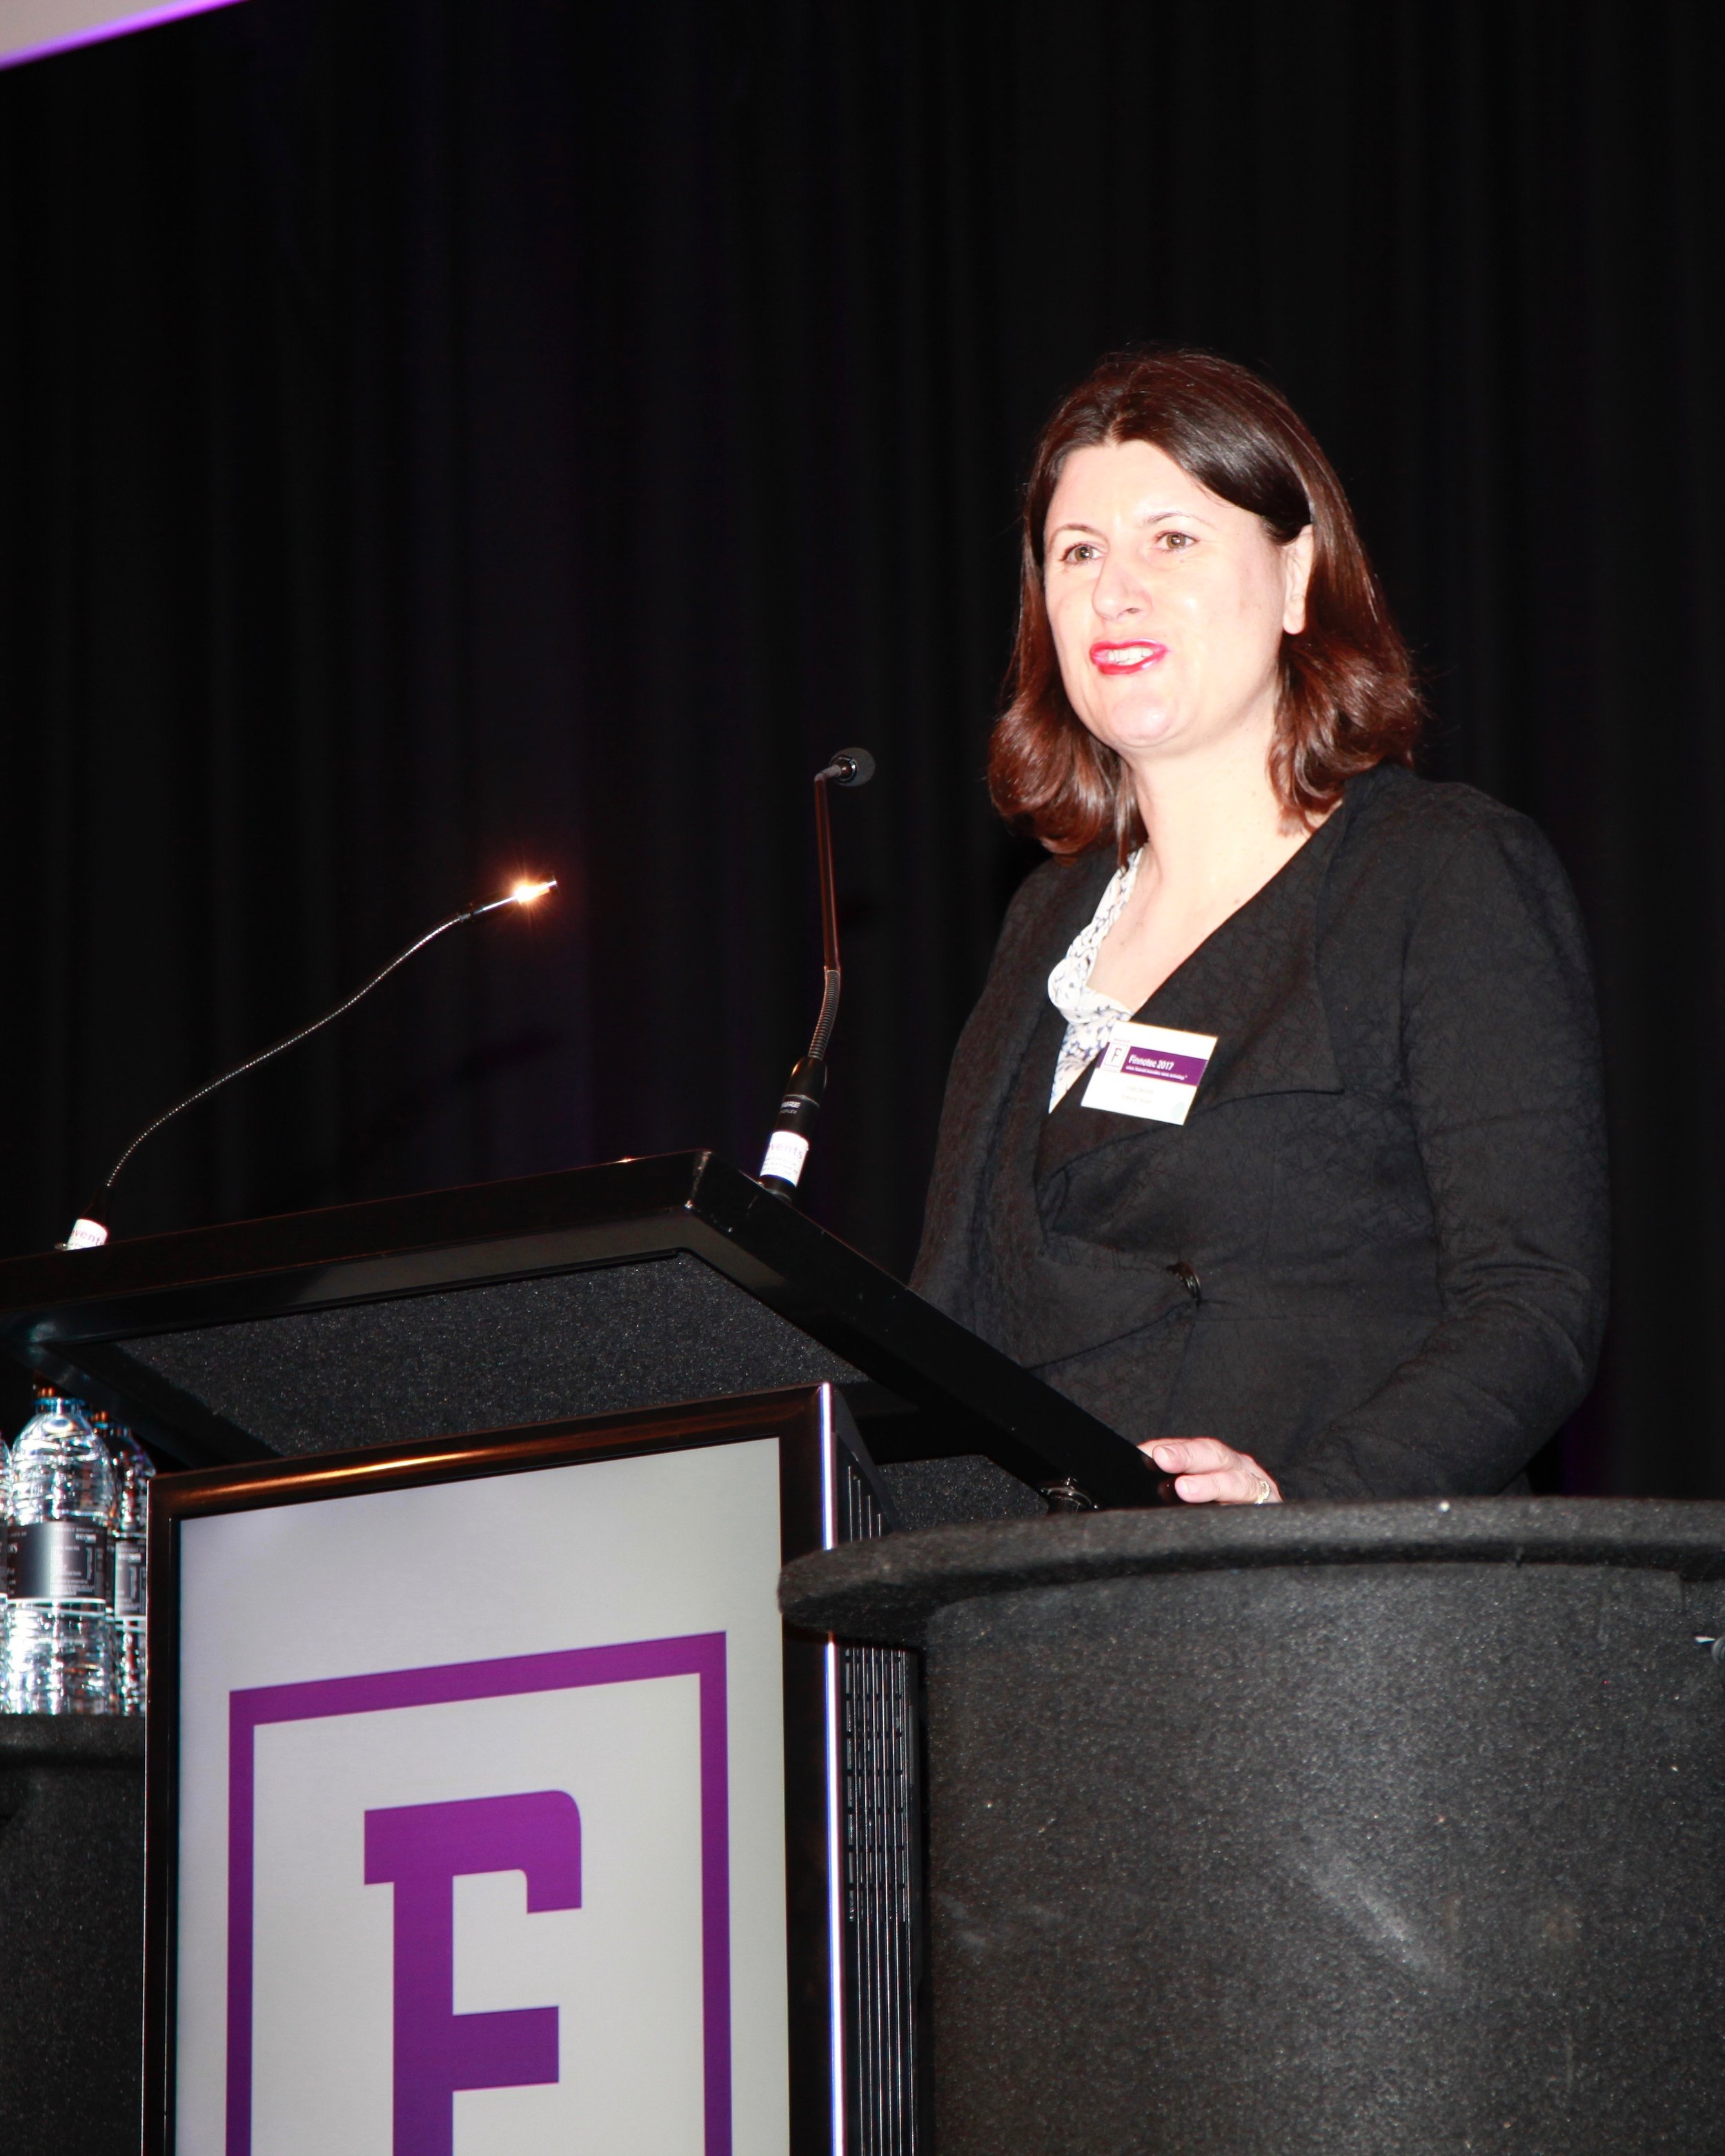 Lisa Mullin, CEO, Anthony Harper